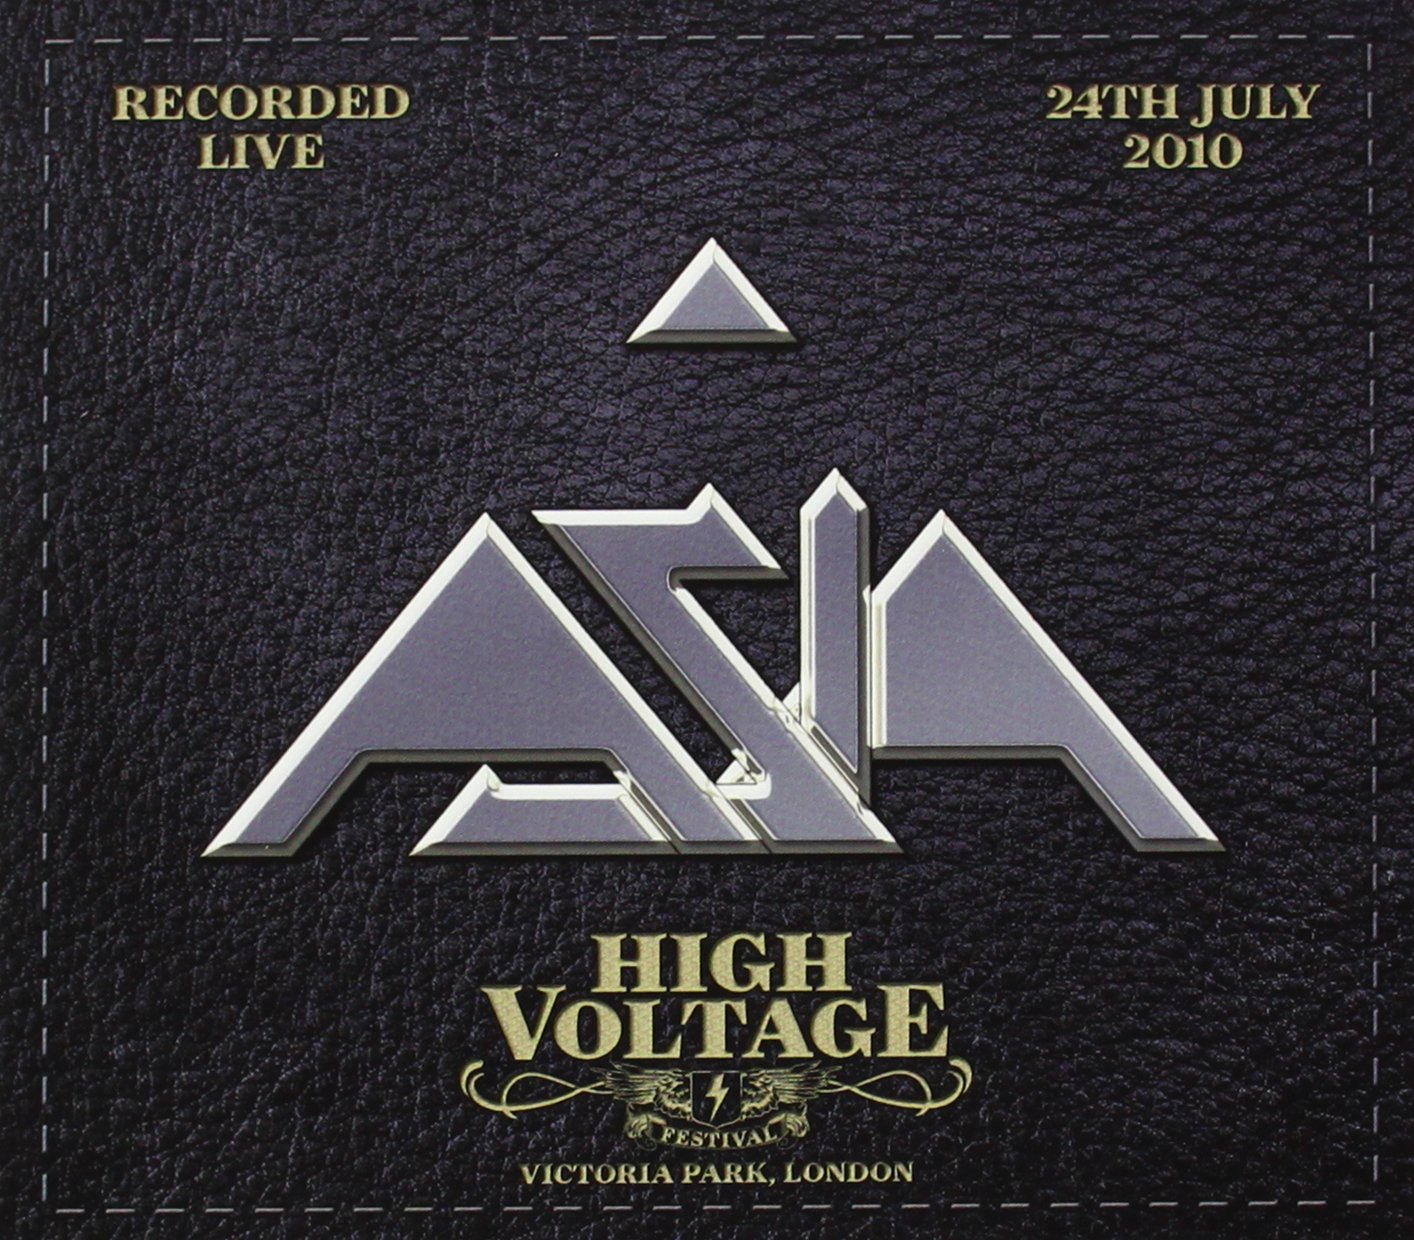 High Voltage Live, 2010